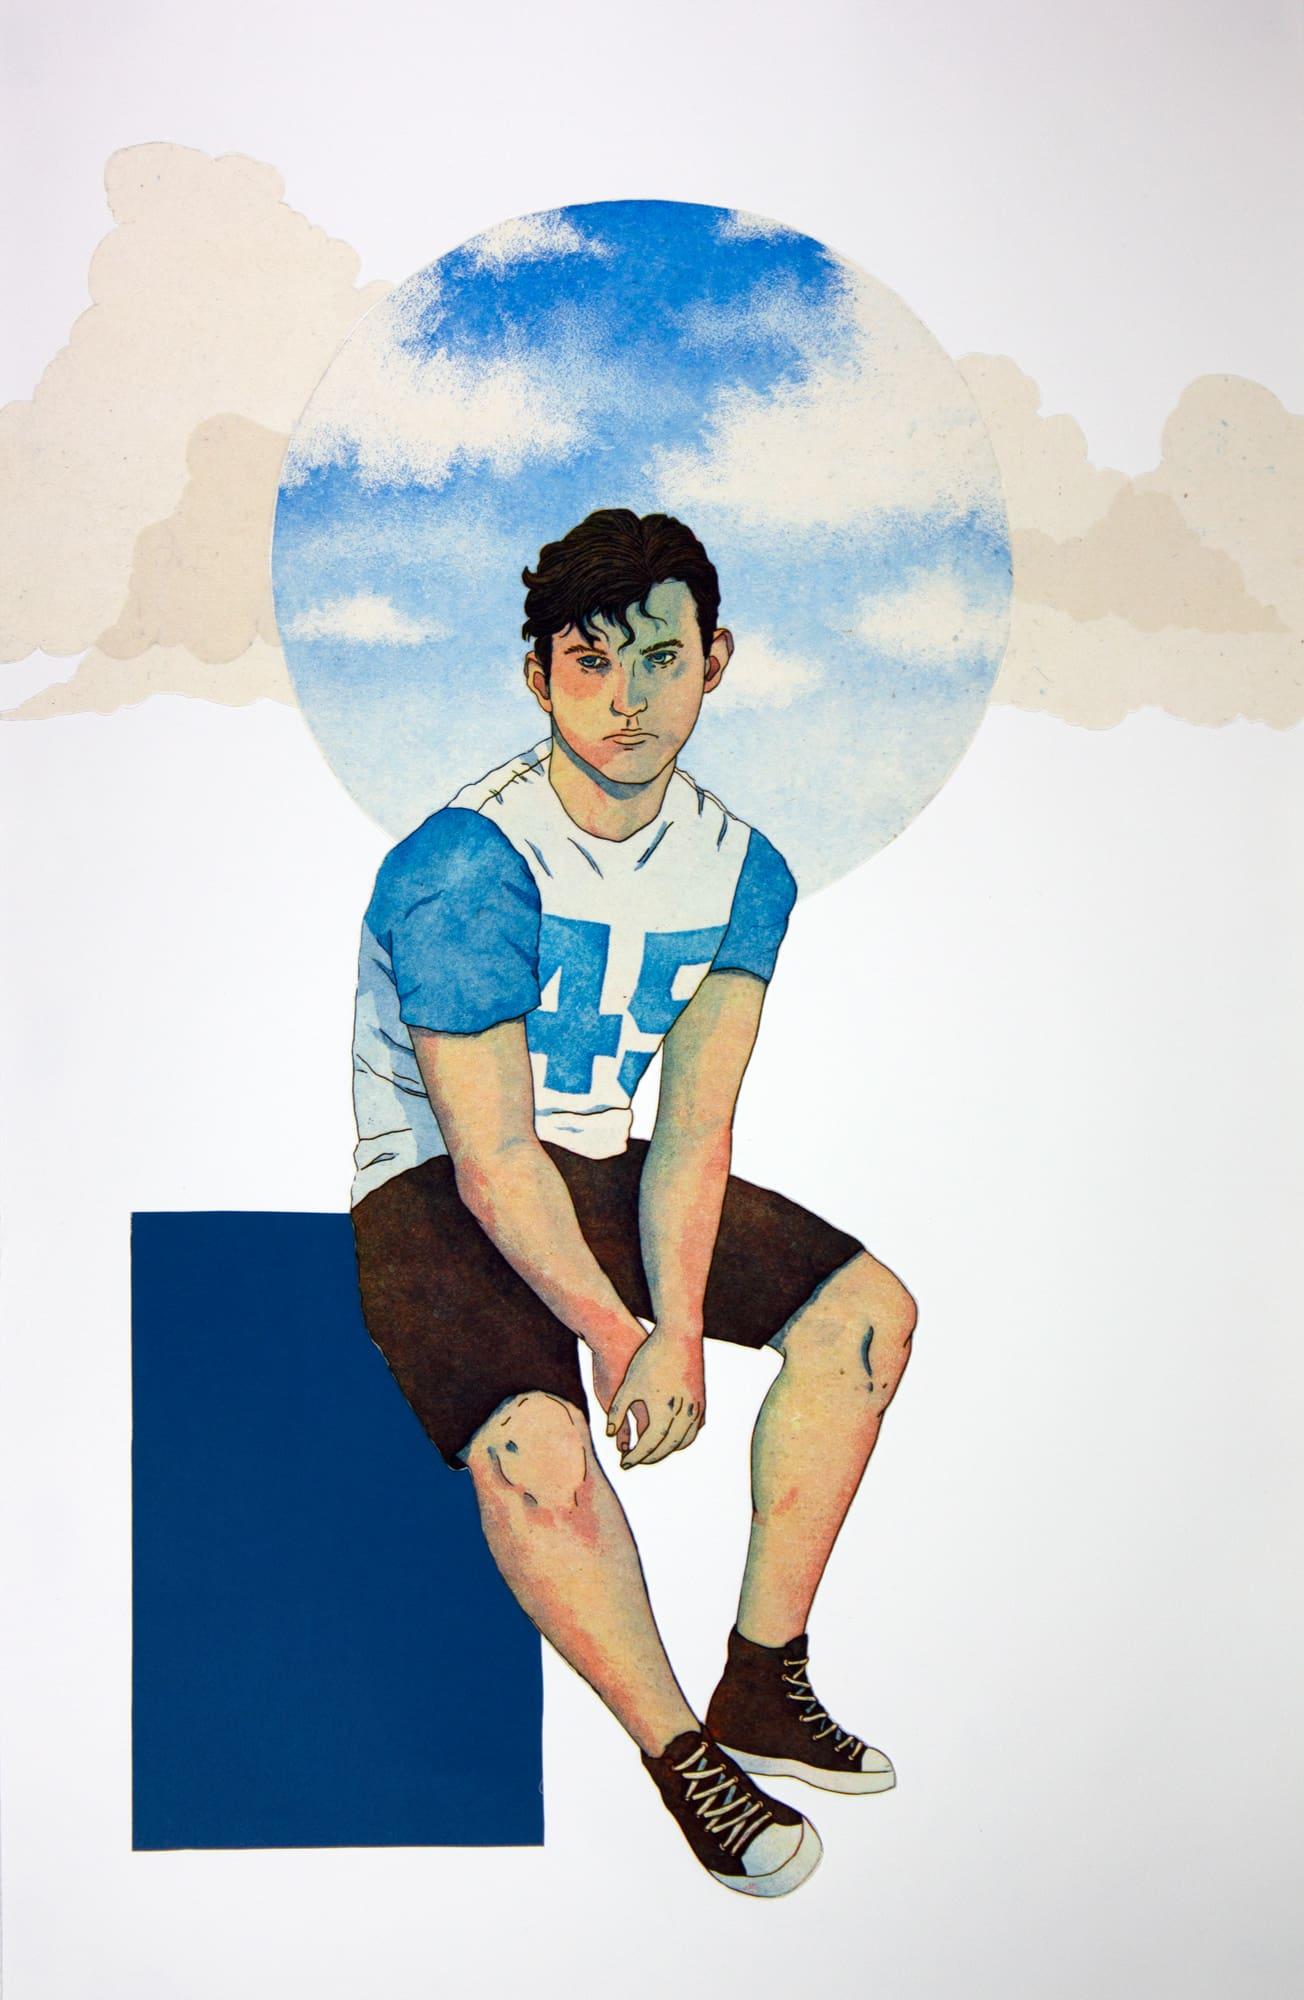 Print of a person sitting on a block by Kawelina Cruz